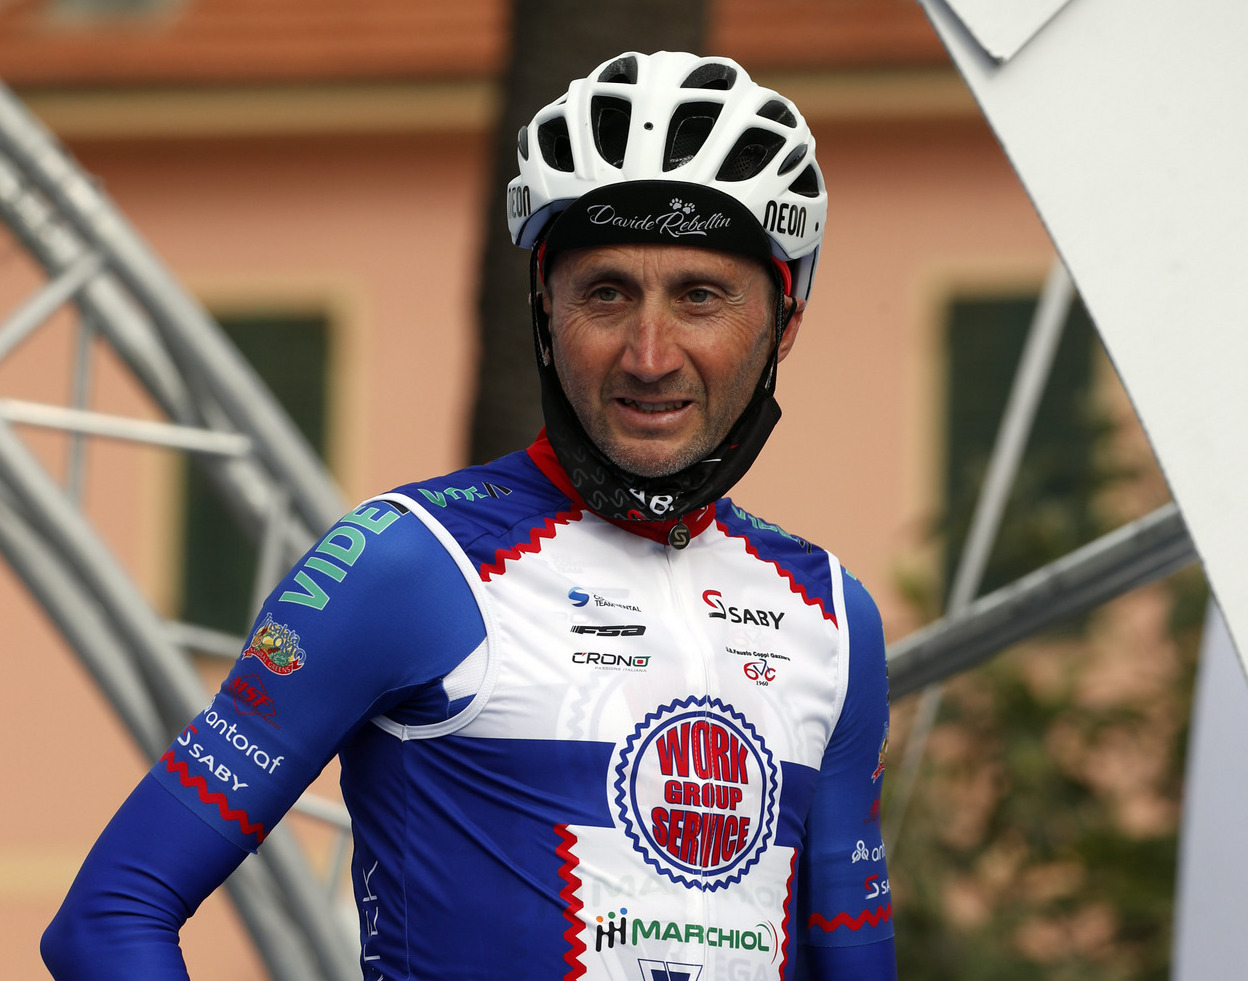 Davide Rebellin began his 2021 season at the Trofeo Laigeuglia despite being close to 50